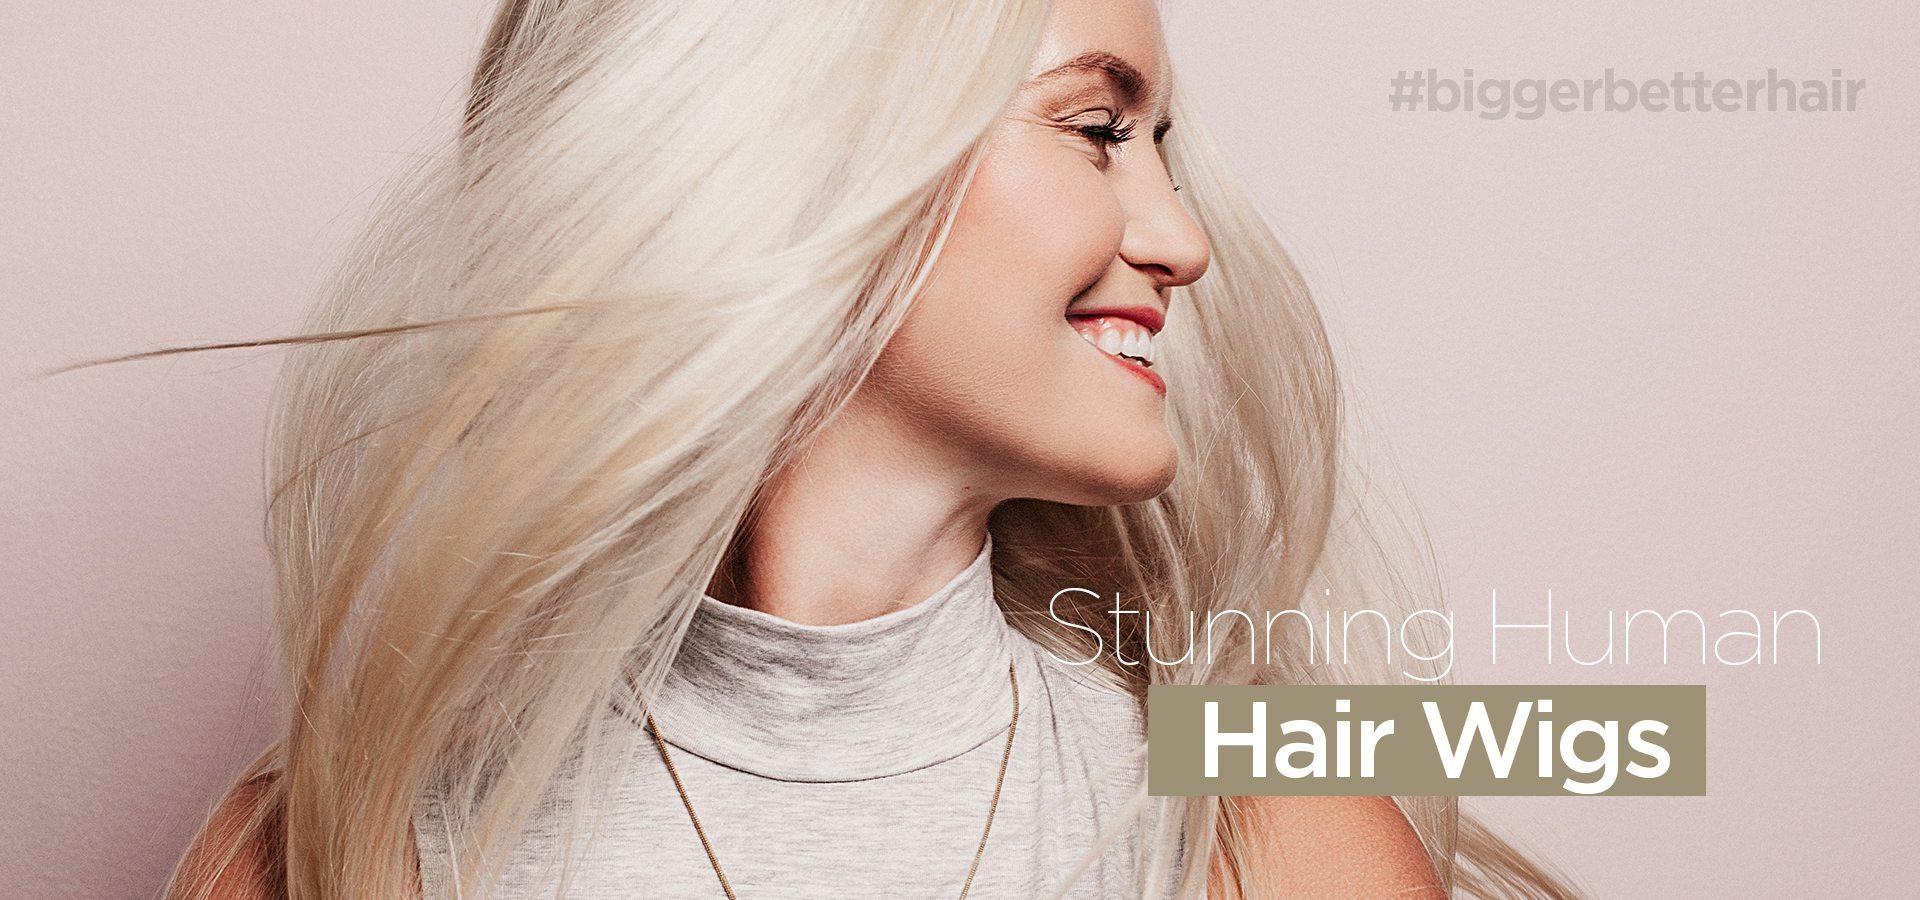 Stunning-Human-Hair-Wigs-1